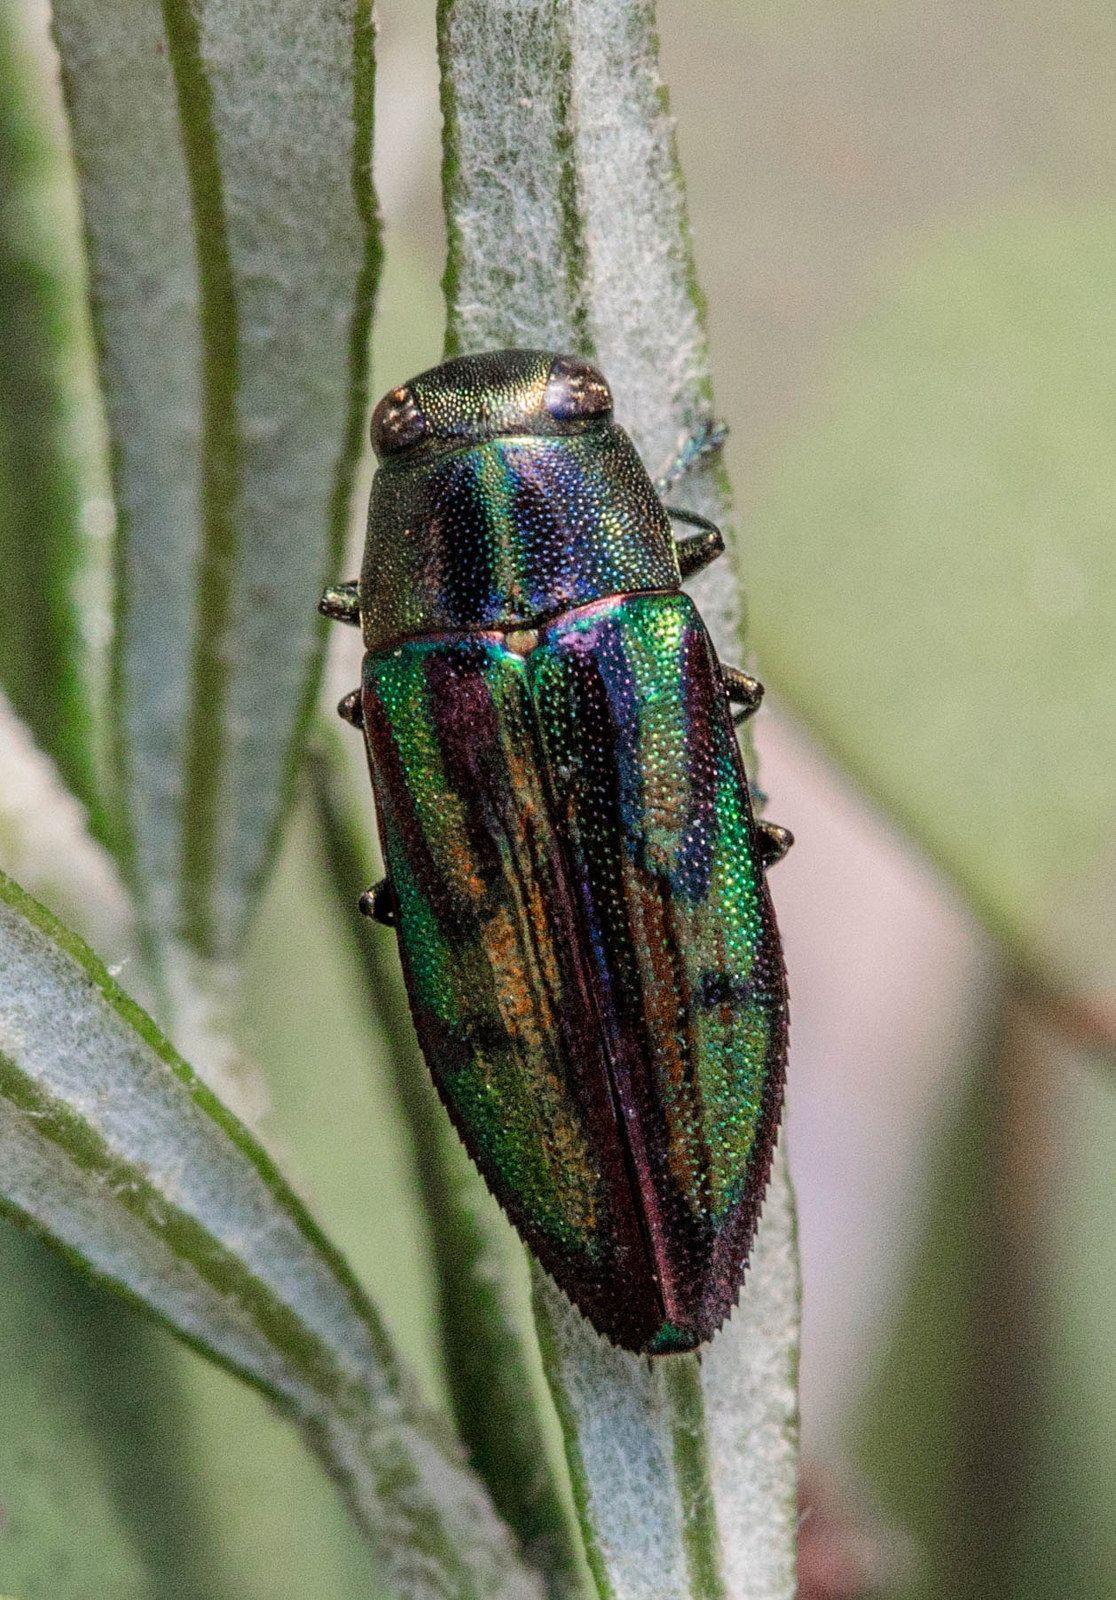 https://flic.kr/p/22jZPsd | Jewel Beetle - Melobasis innocua